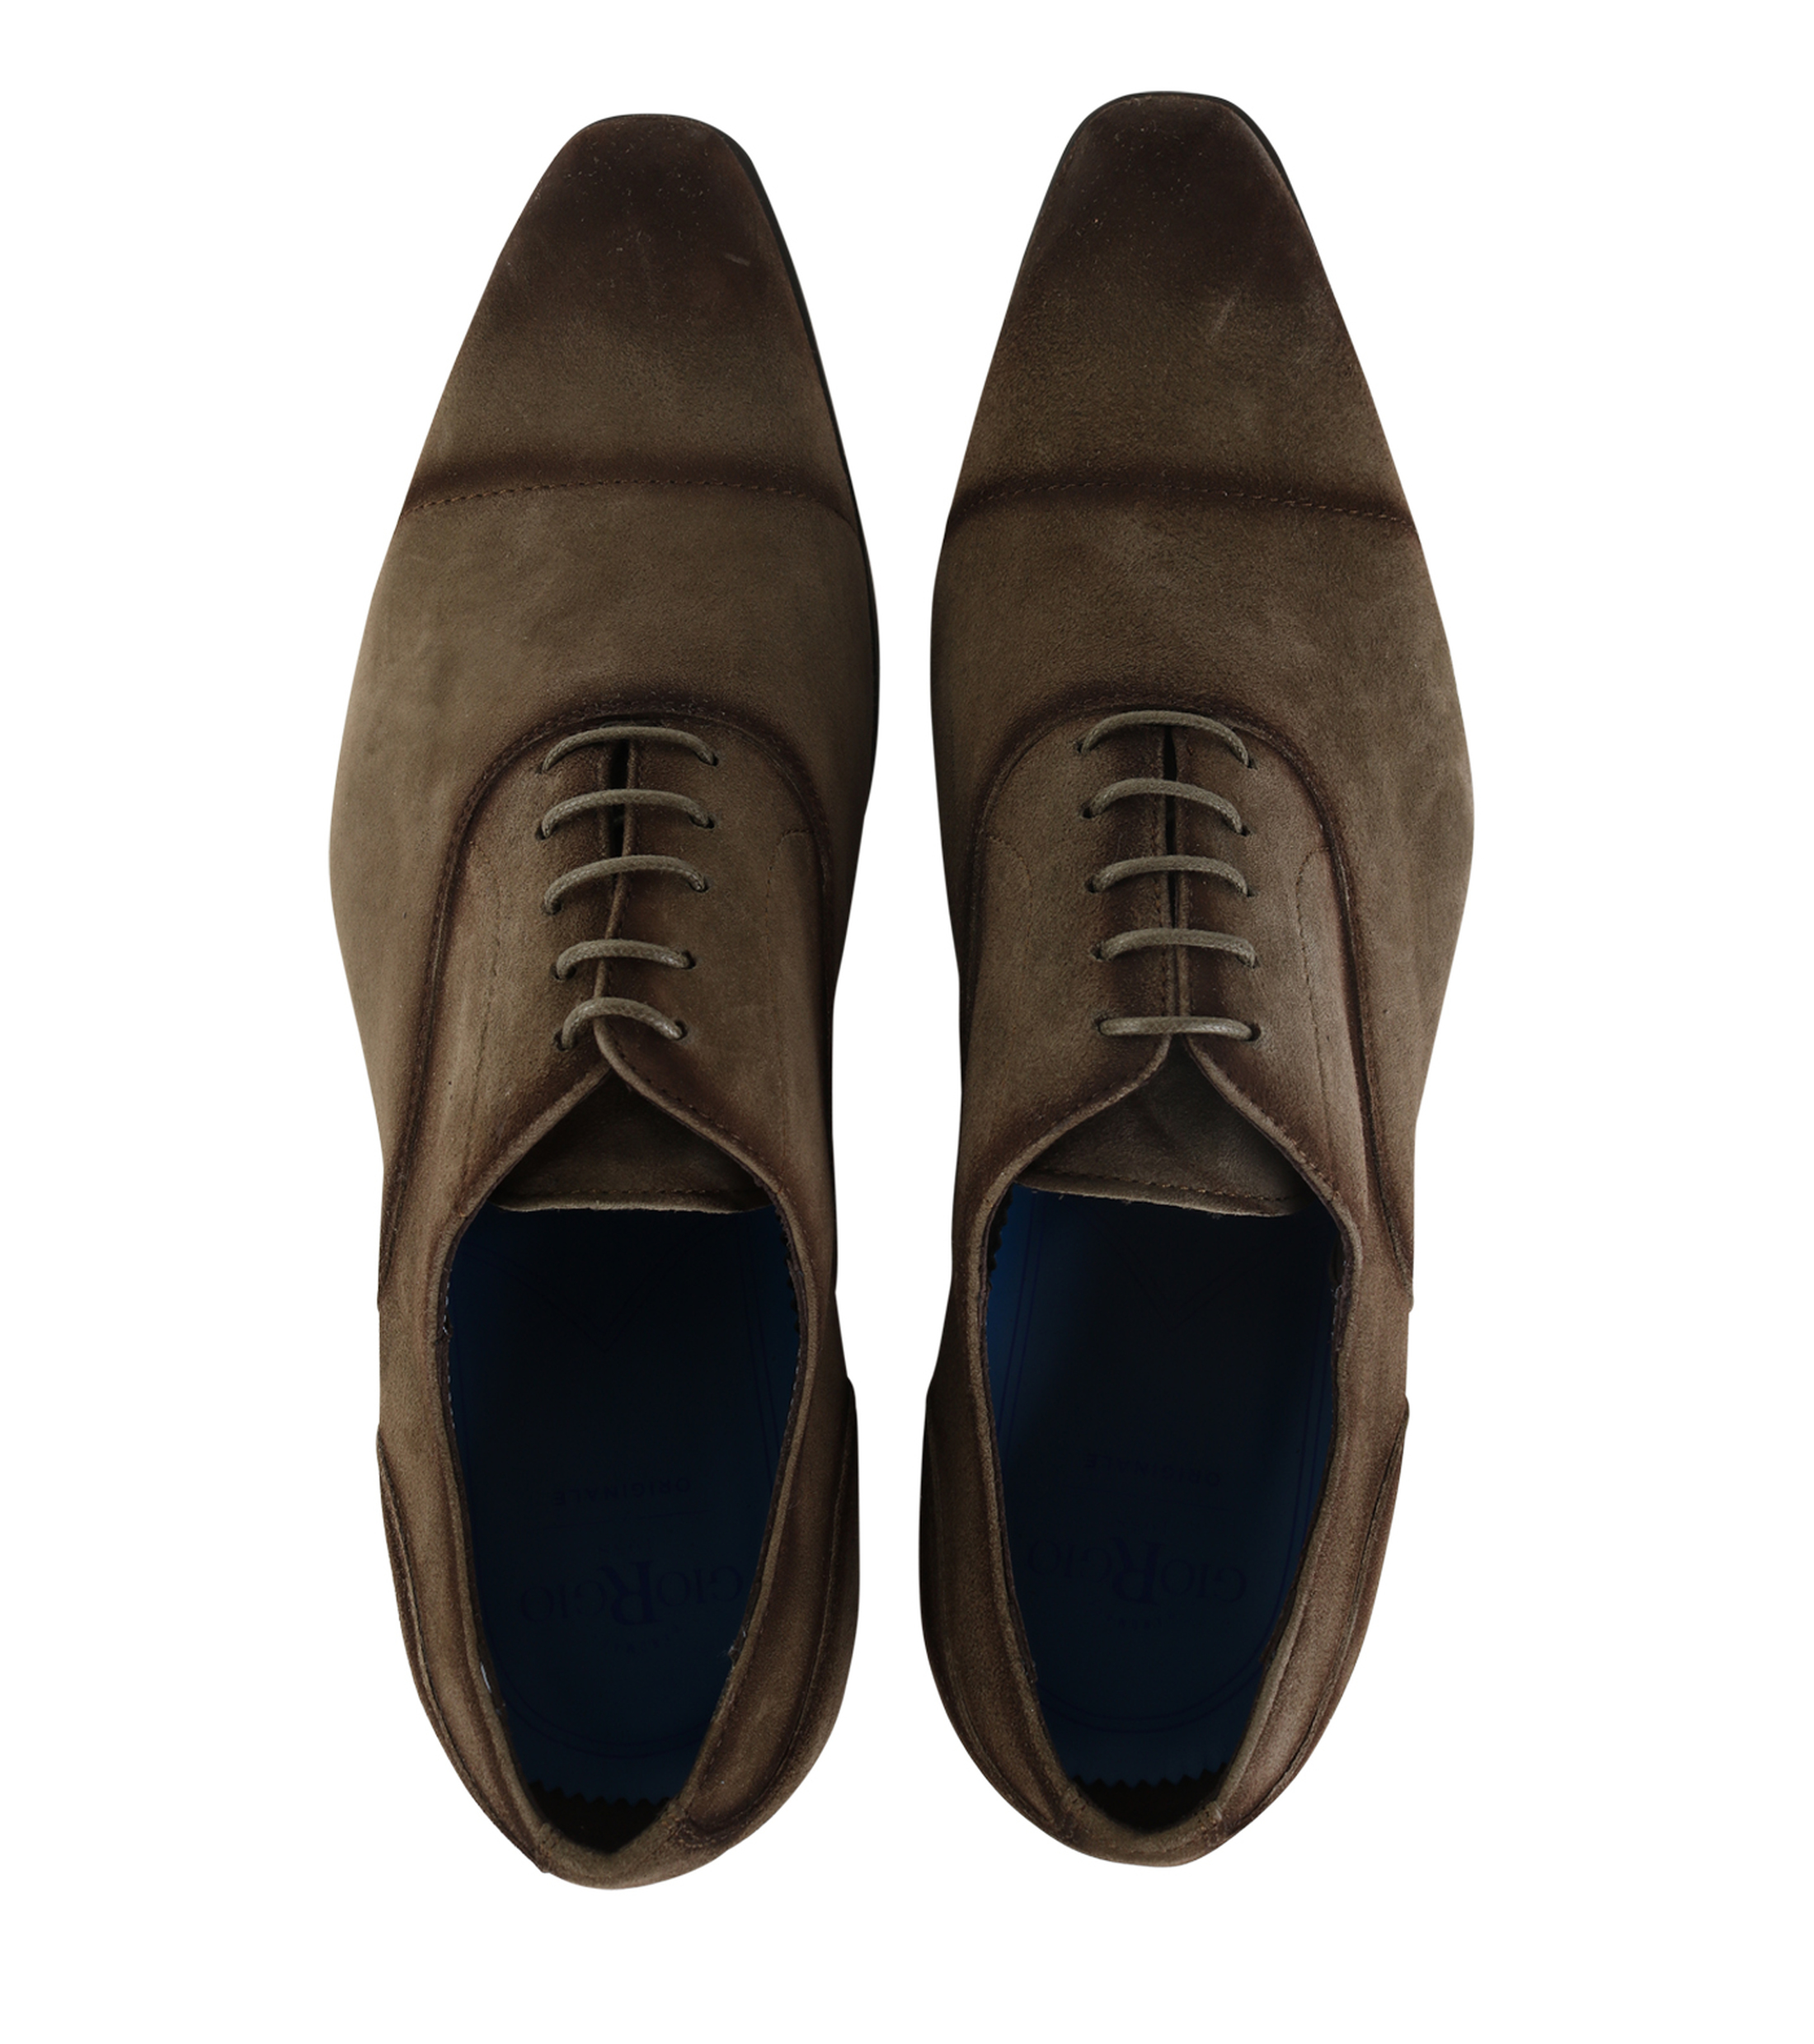 Giorgio Amalfi En Daim Chaussures À Lacets Vert 8x4s3Q